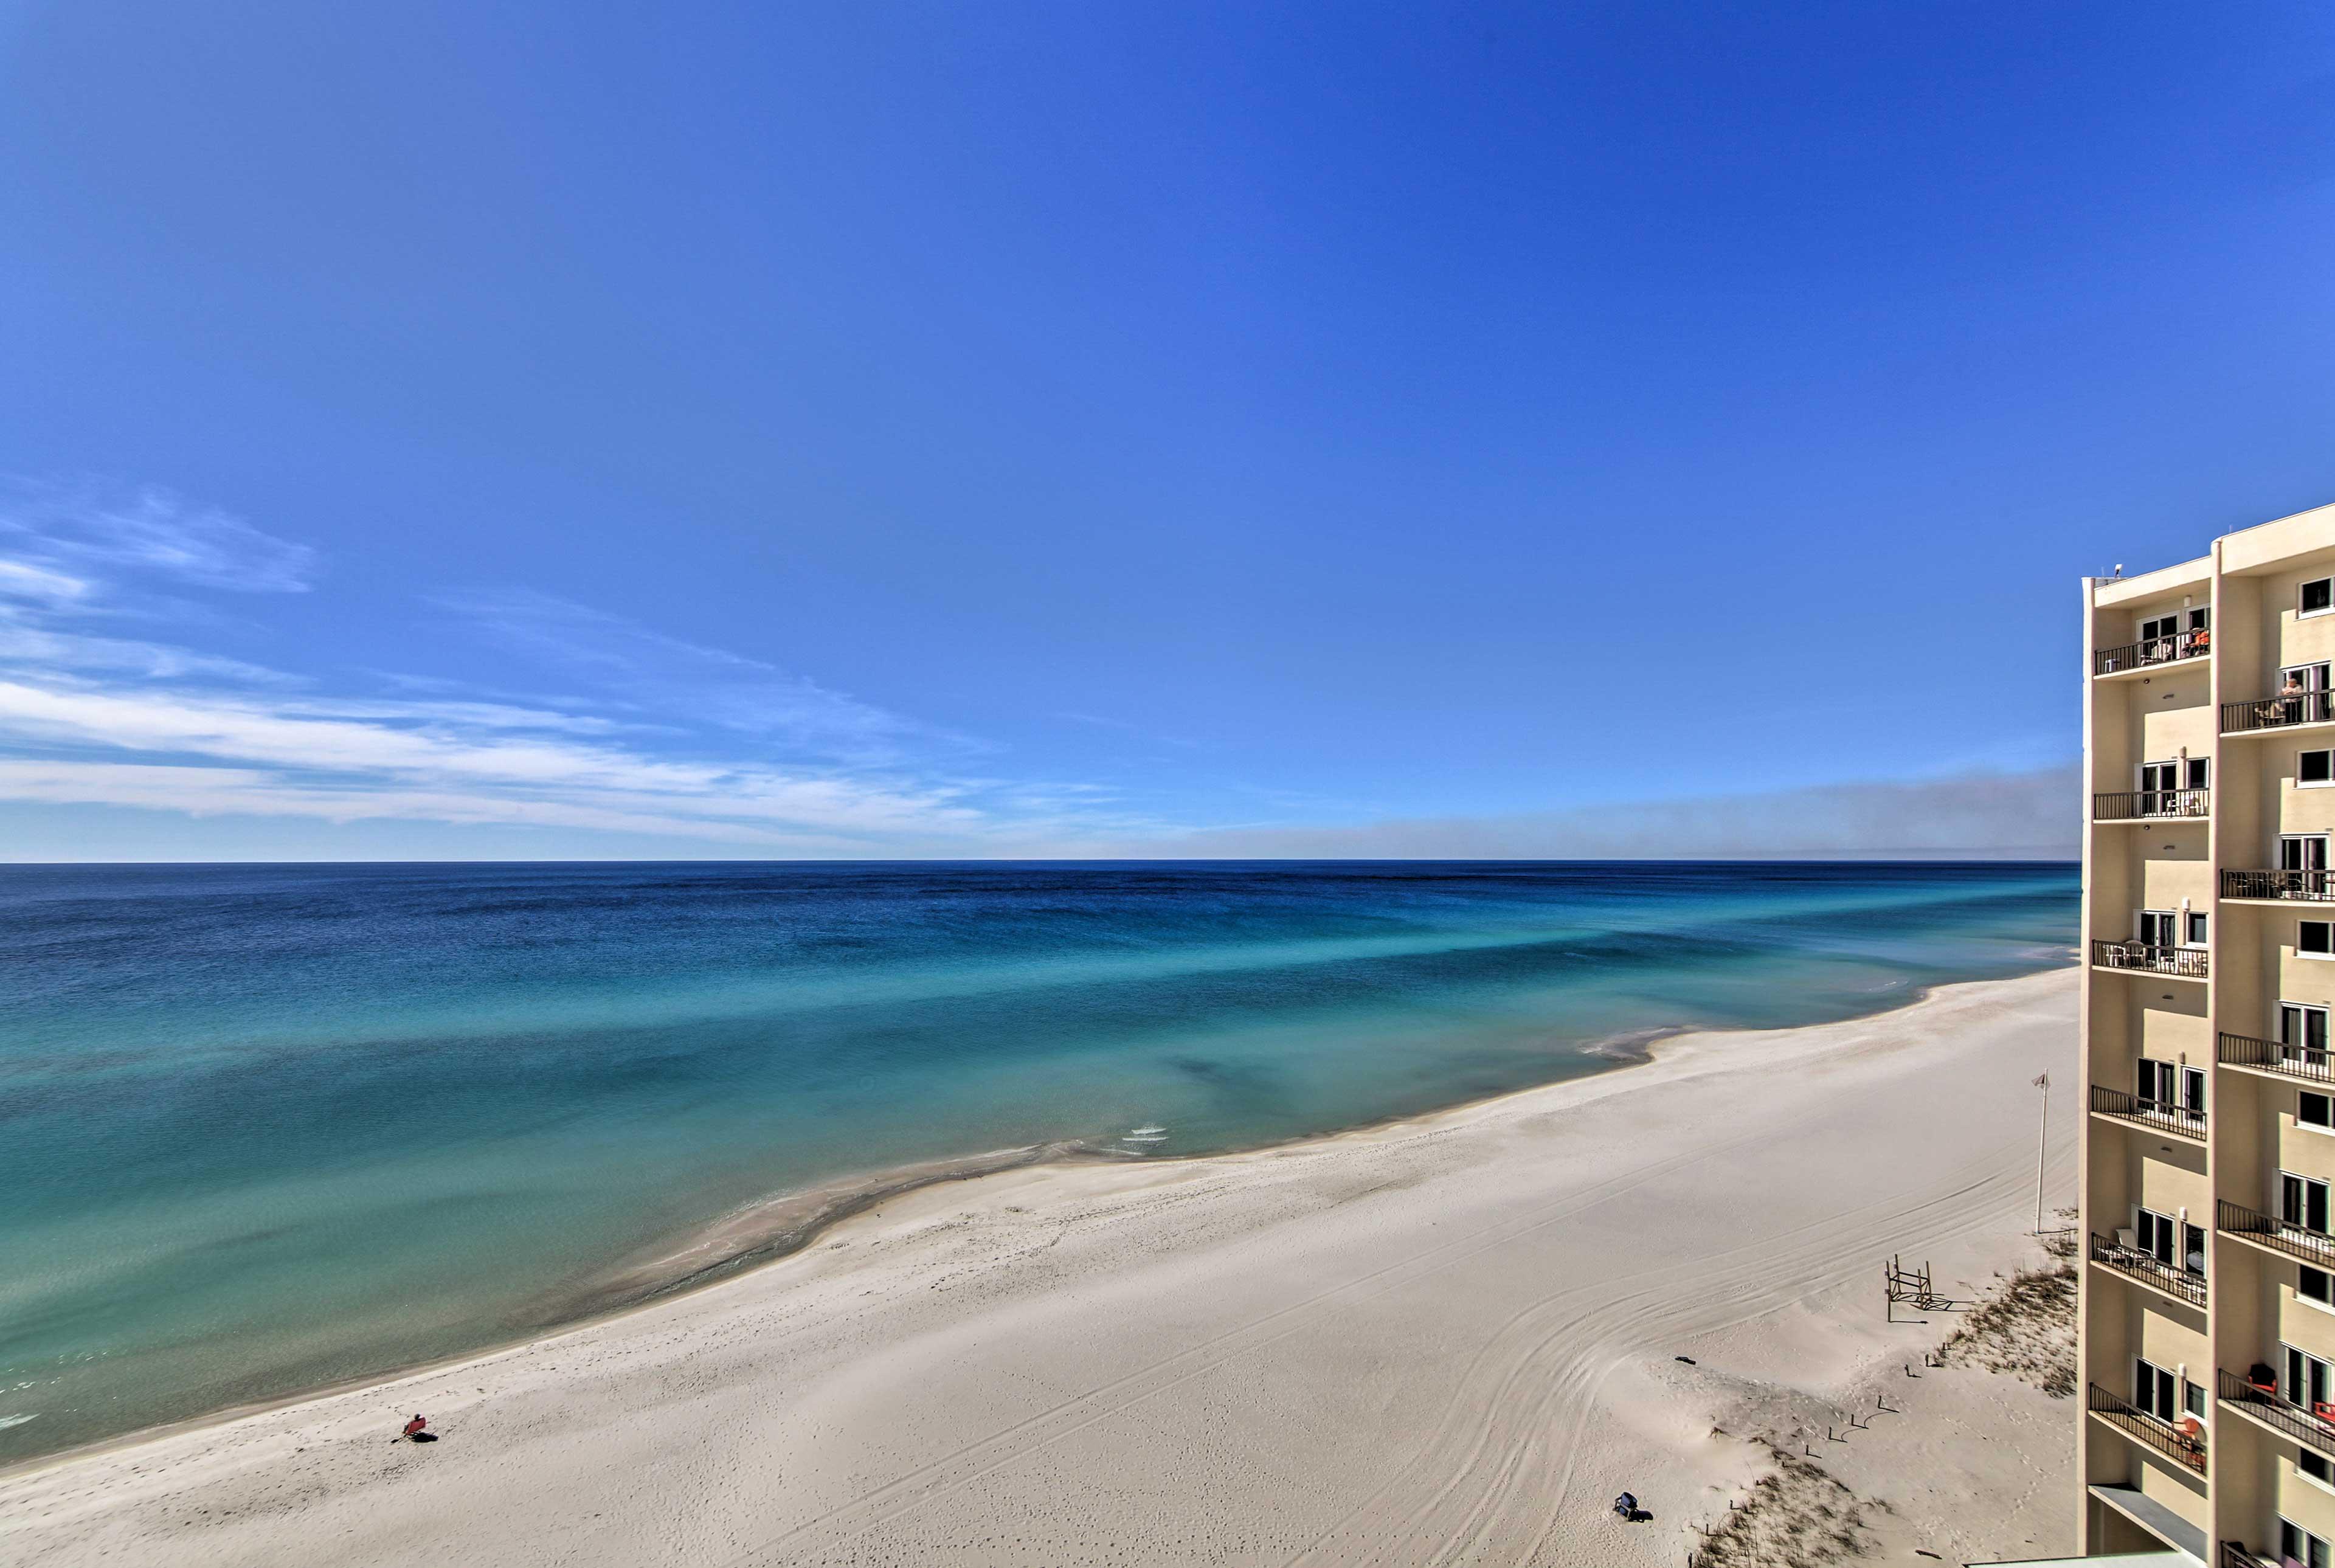 Retreat to Panama City Beach at this vacation rental condo!